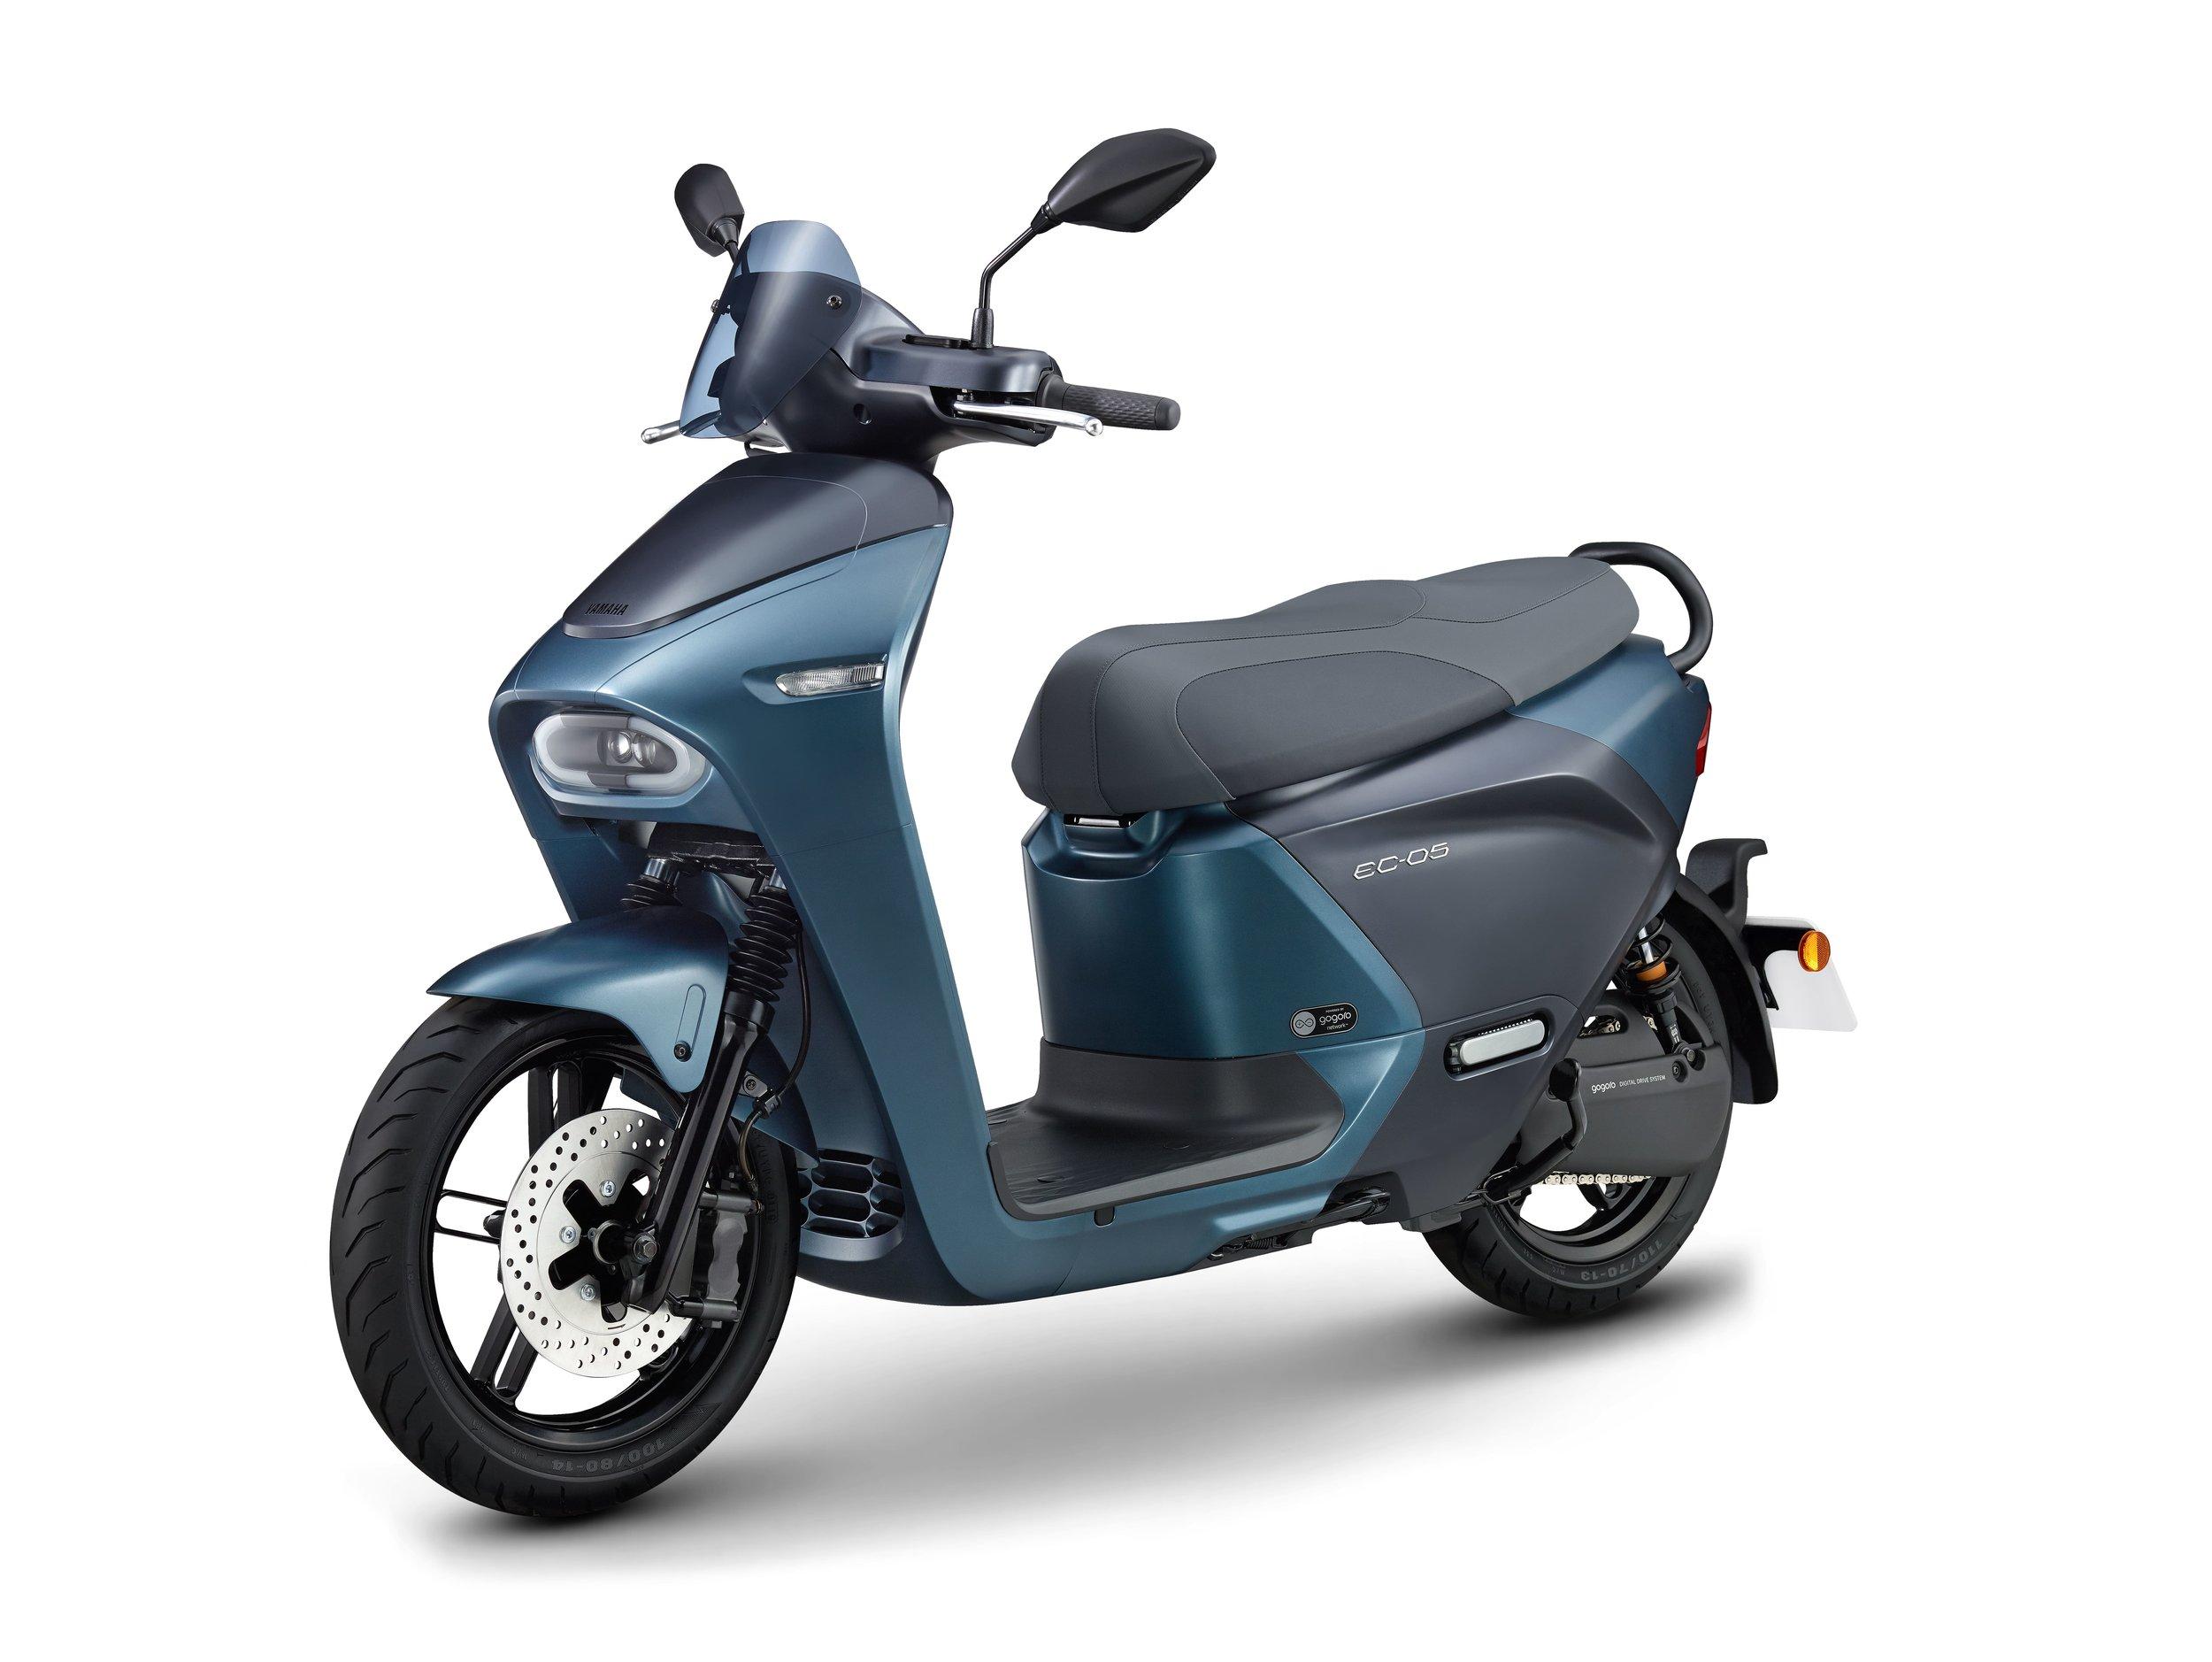 YAMAHA EC-05_07_Isolate Blue_請務必載明出處Provided by Yamaha Motor Co., Ltd.jpg